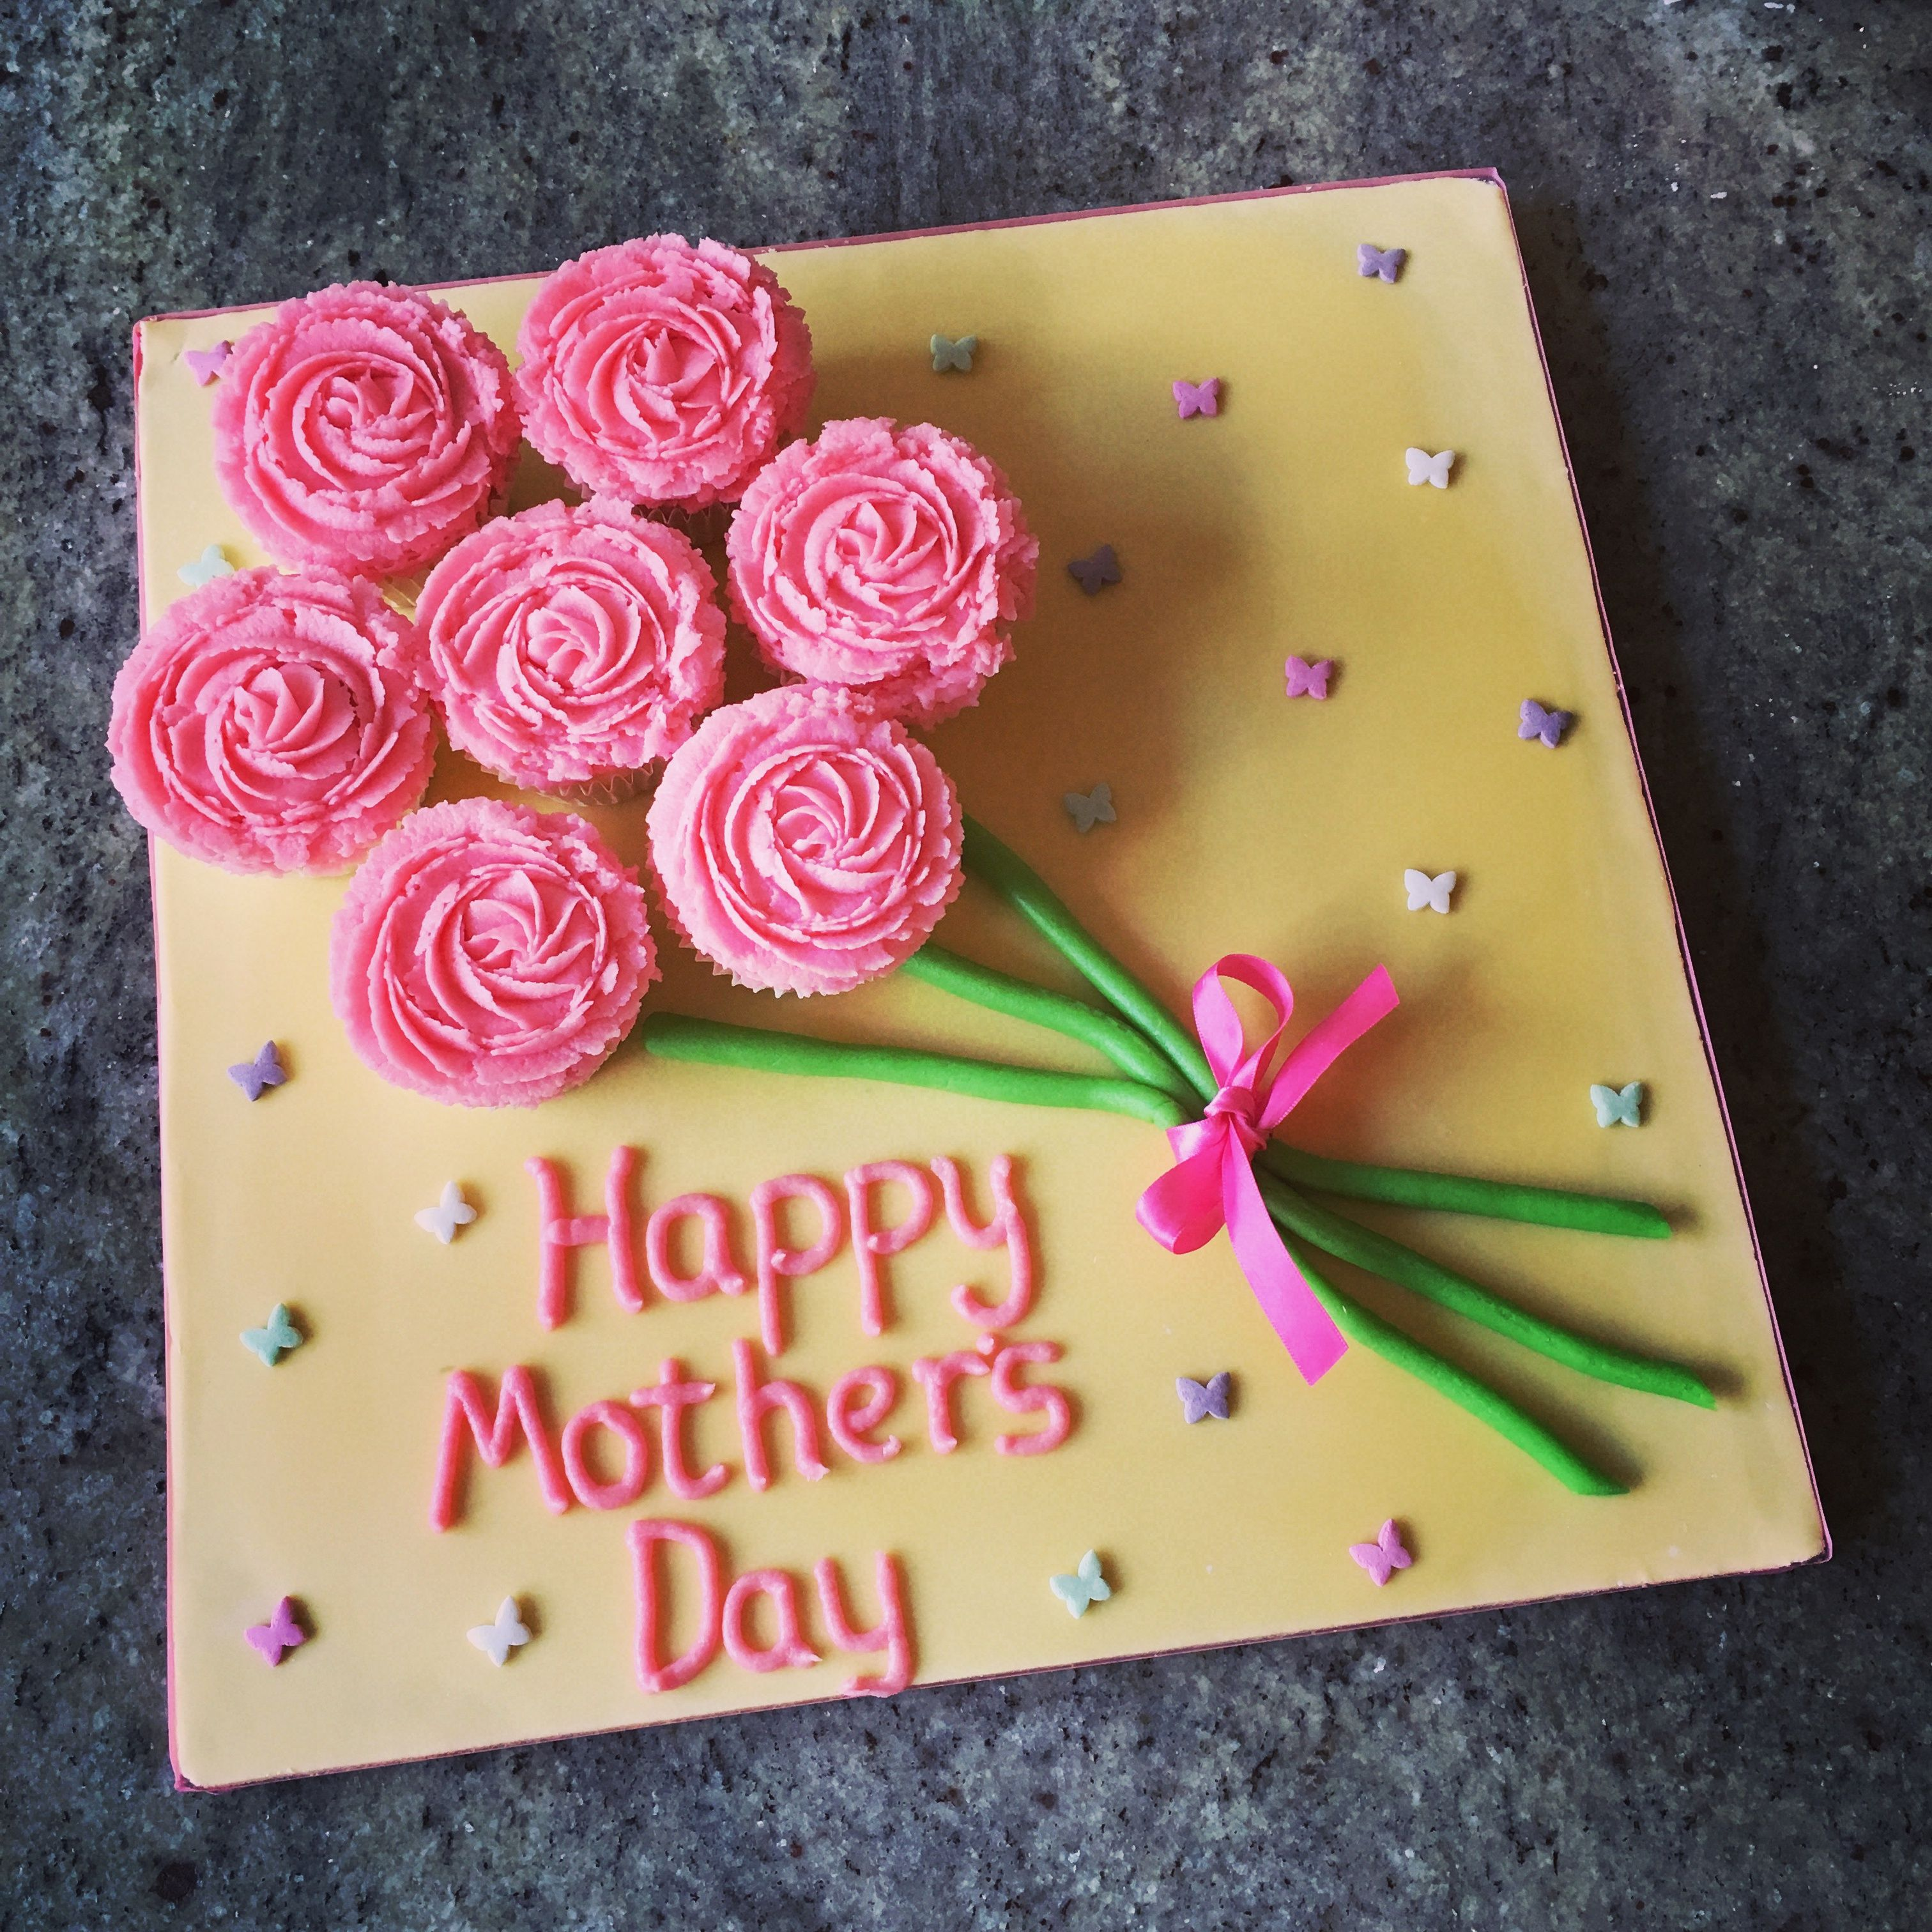 Mother S Day Cupcakes Mothers Day Cupcakes Mothers Day Desserts Mothers Day Cakes Designs